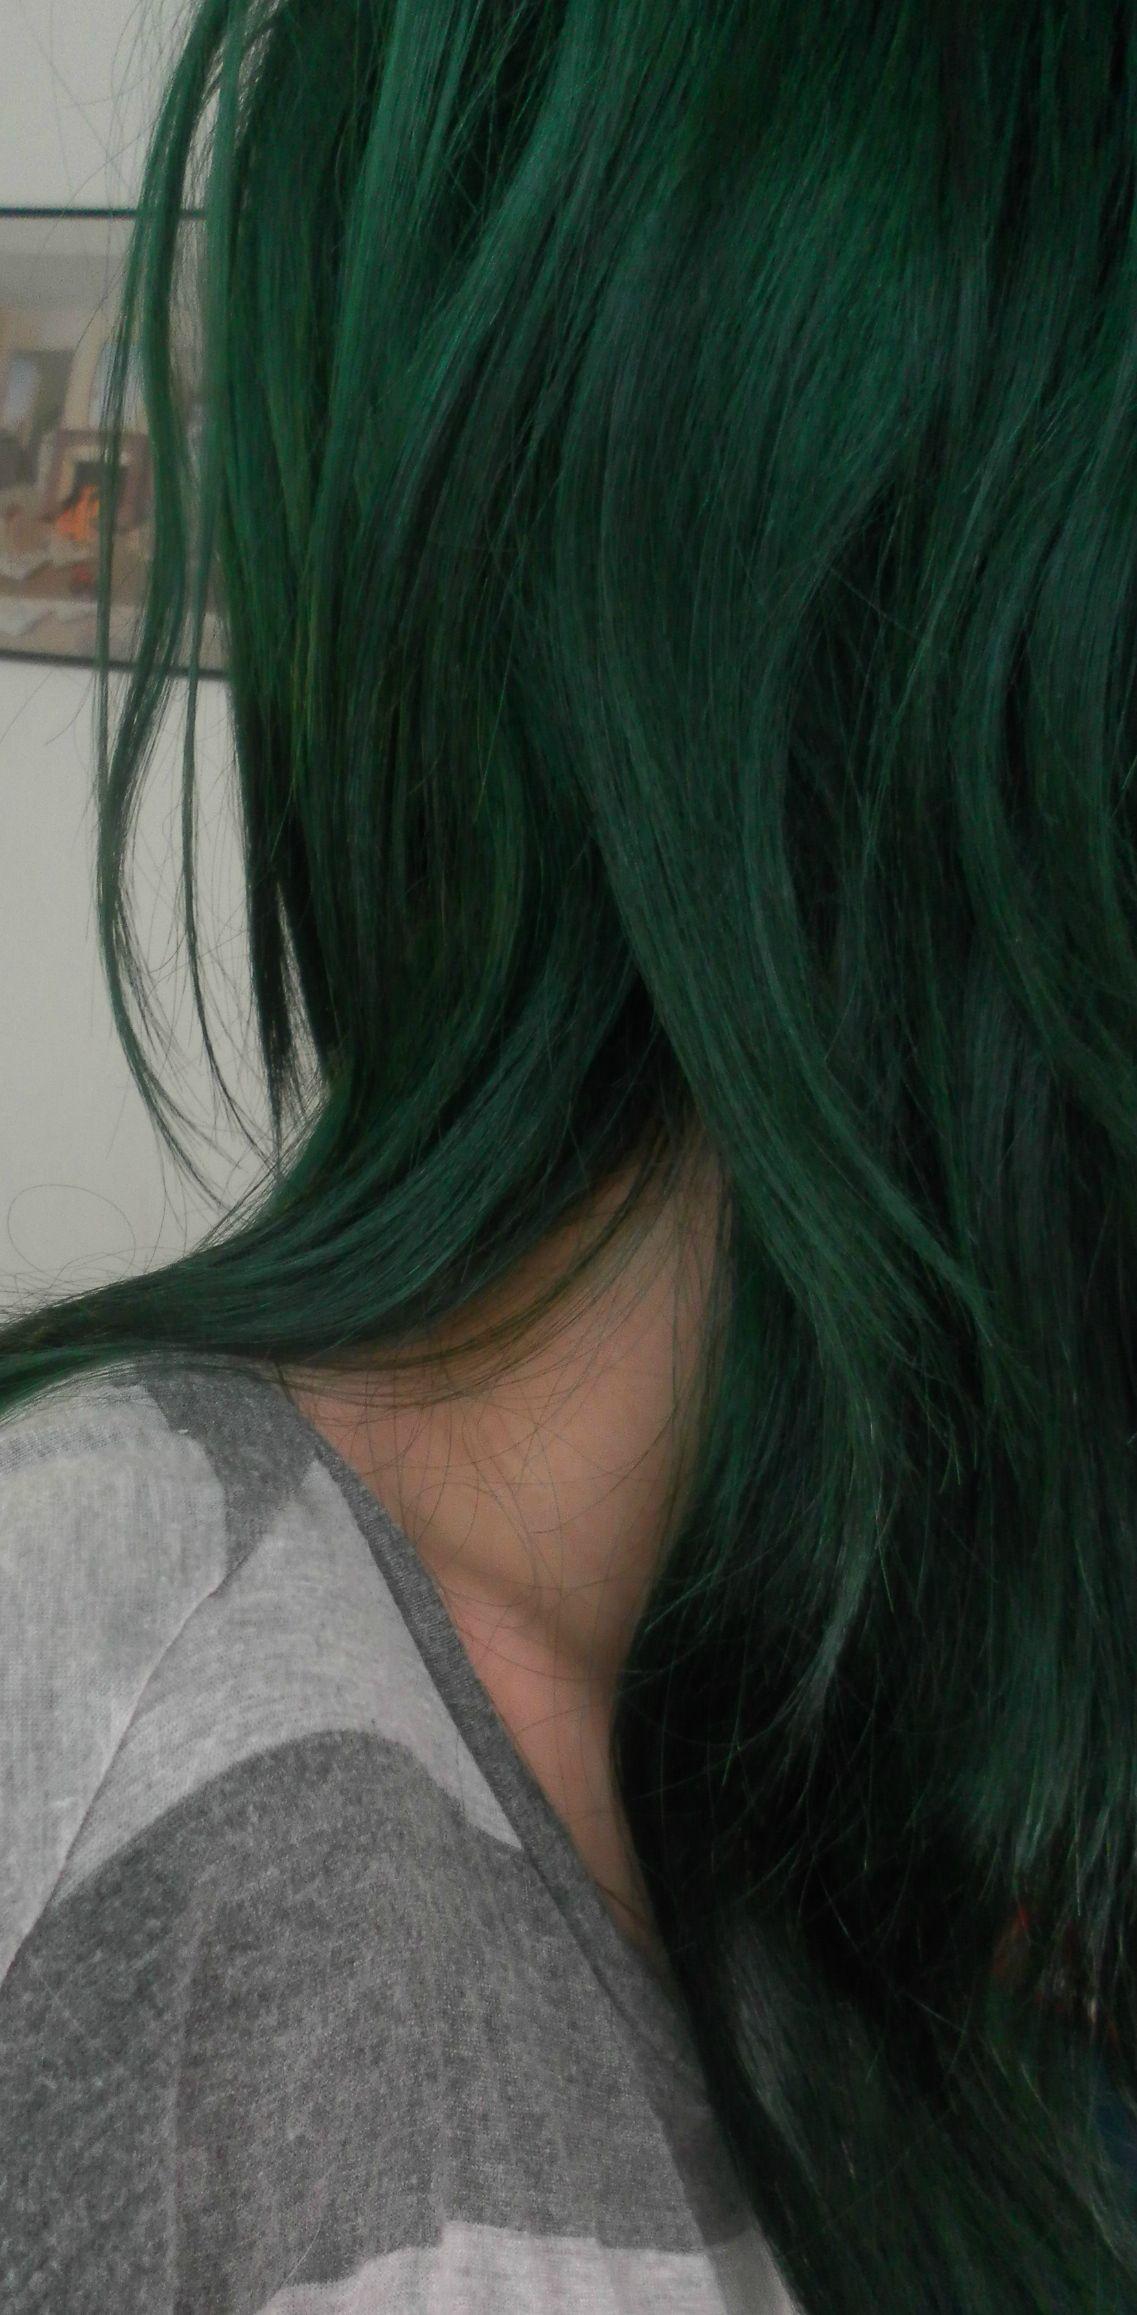 2b012e122bca Manic Panic Venus Envy is SO FREAKIN' AWESOME! - Forums - HairCrazy.com